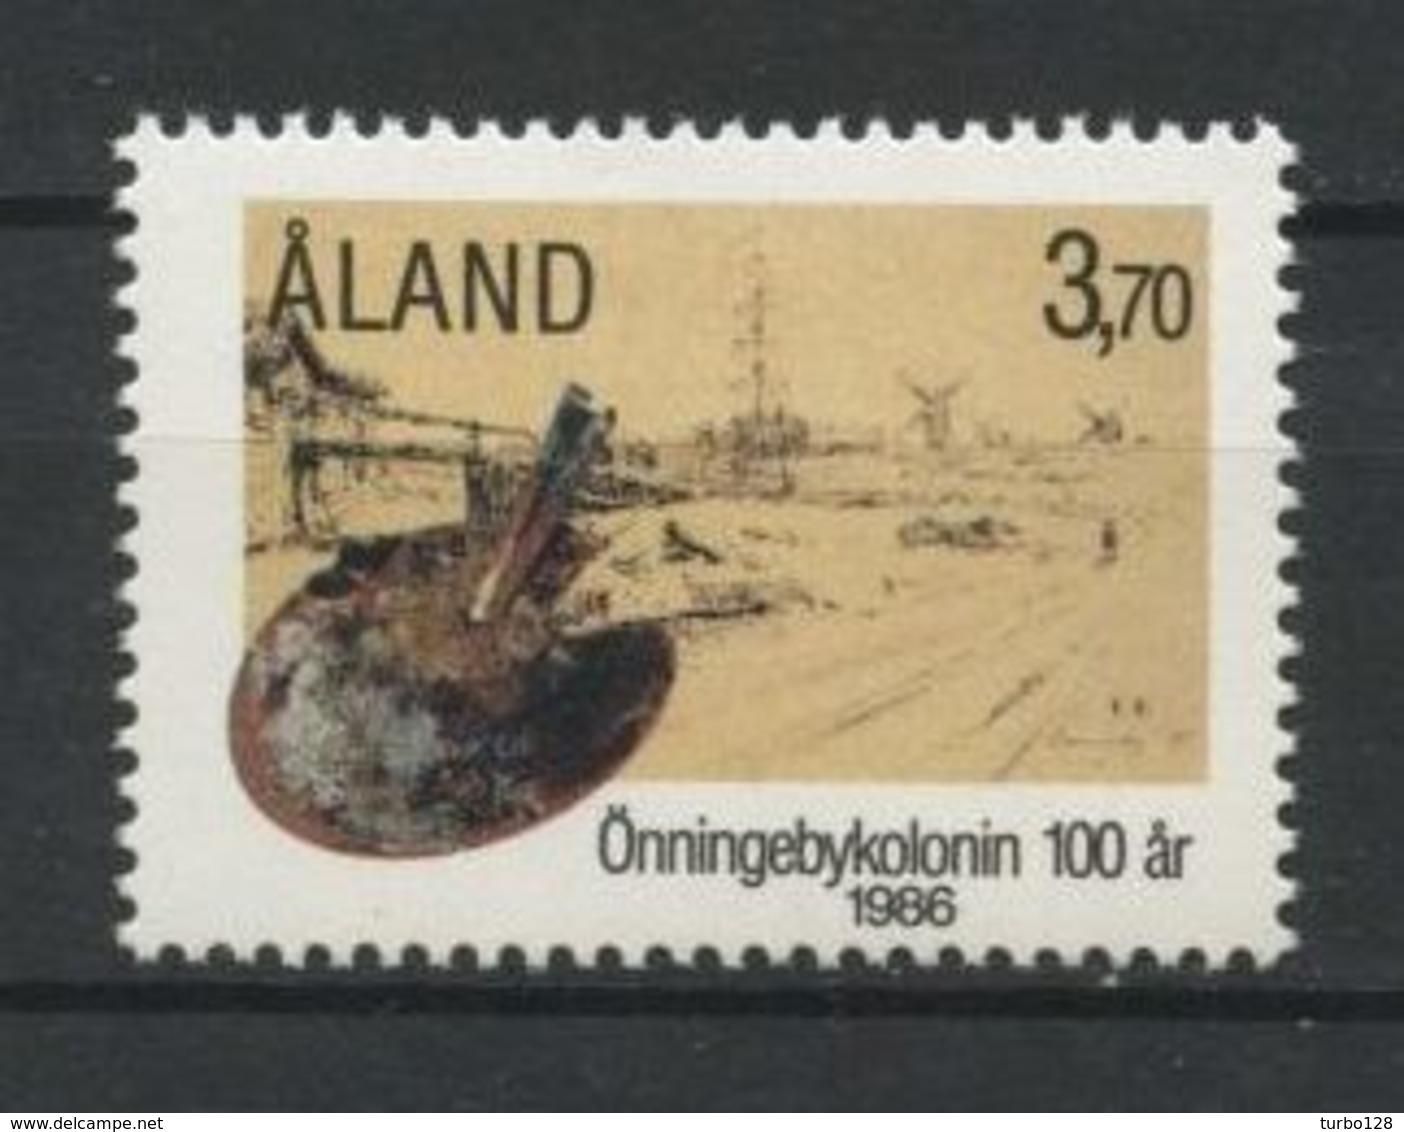 ALAND 1986 N° 19 ** Neuf MNH Superbe Colonie D' Artistes D' Onningeby Peintures Palette Aquarelle Westerholm Paintings - Aland